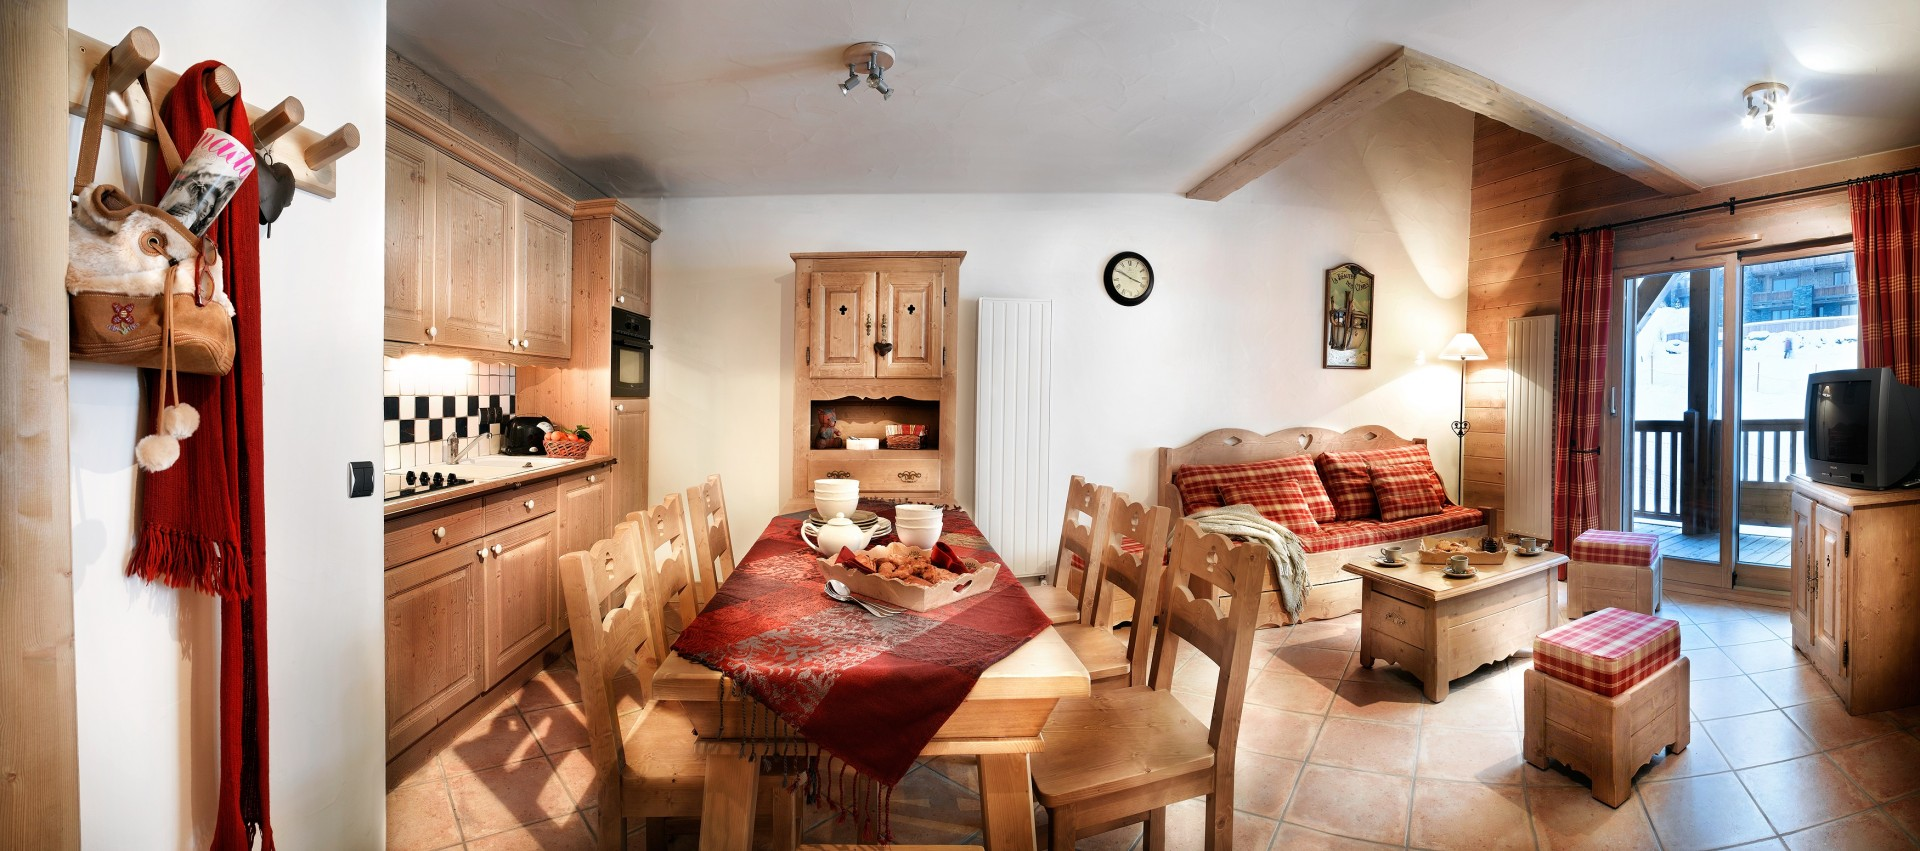 Sainte Foy Tarentaise Location Appartement Luxe Lucky Stone Salon